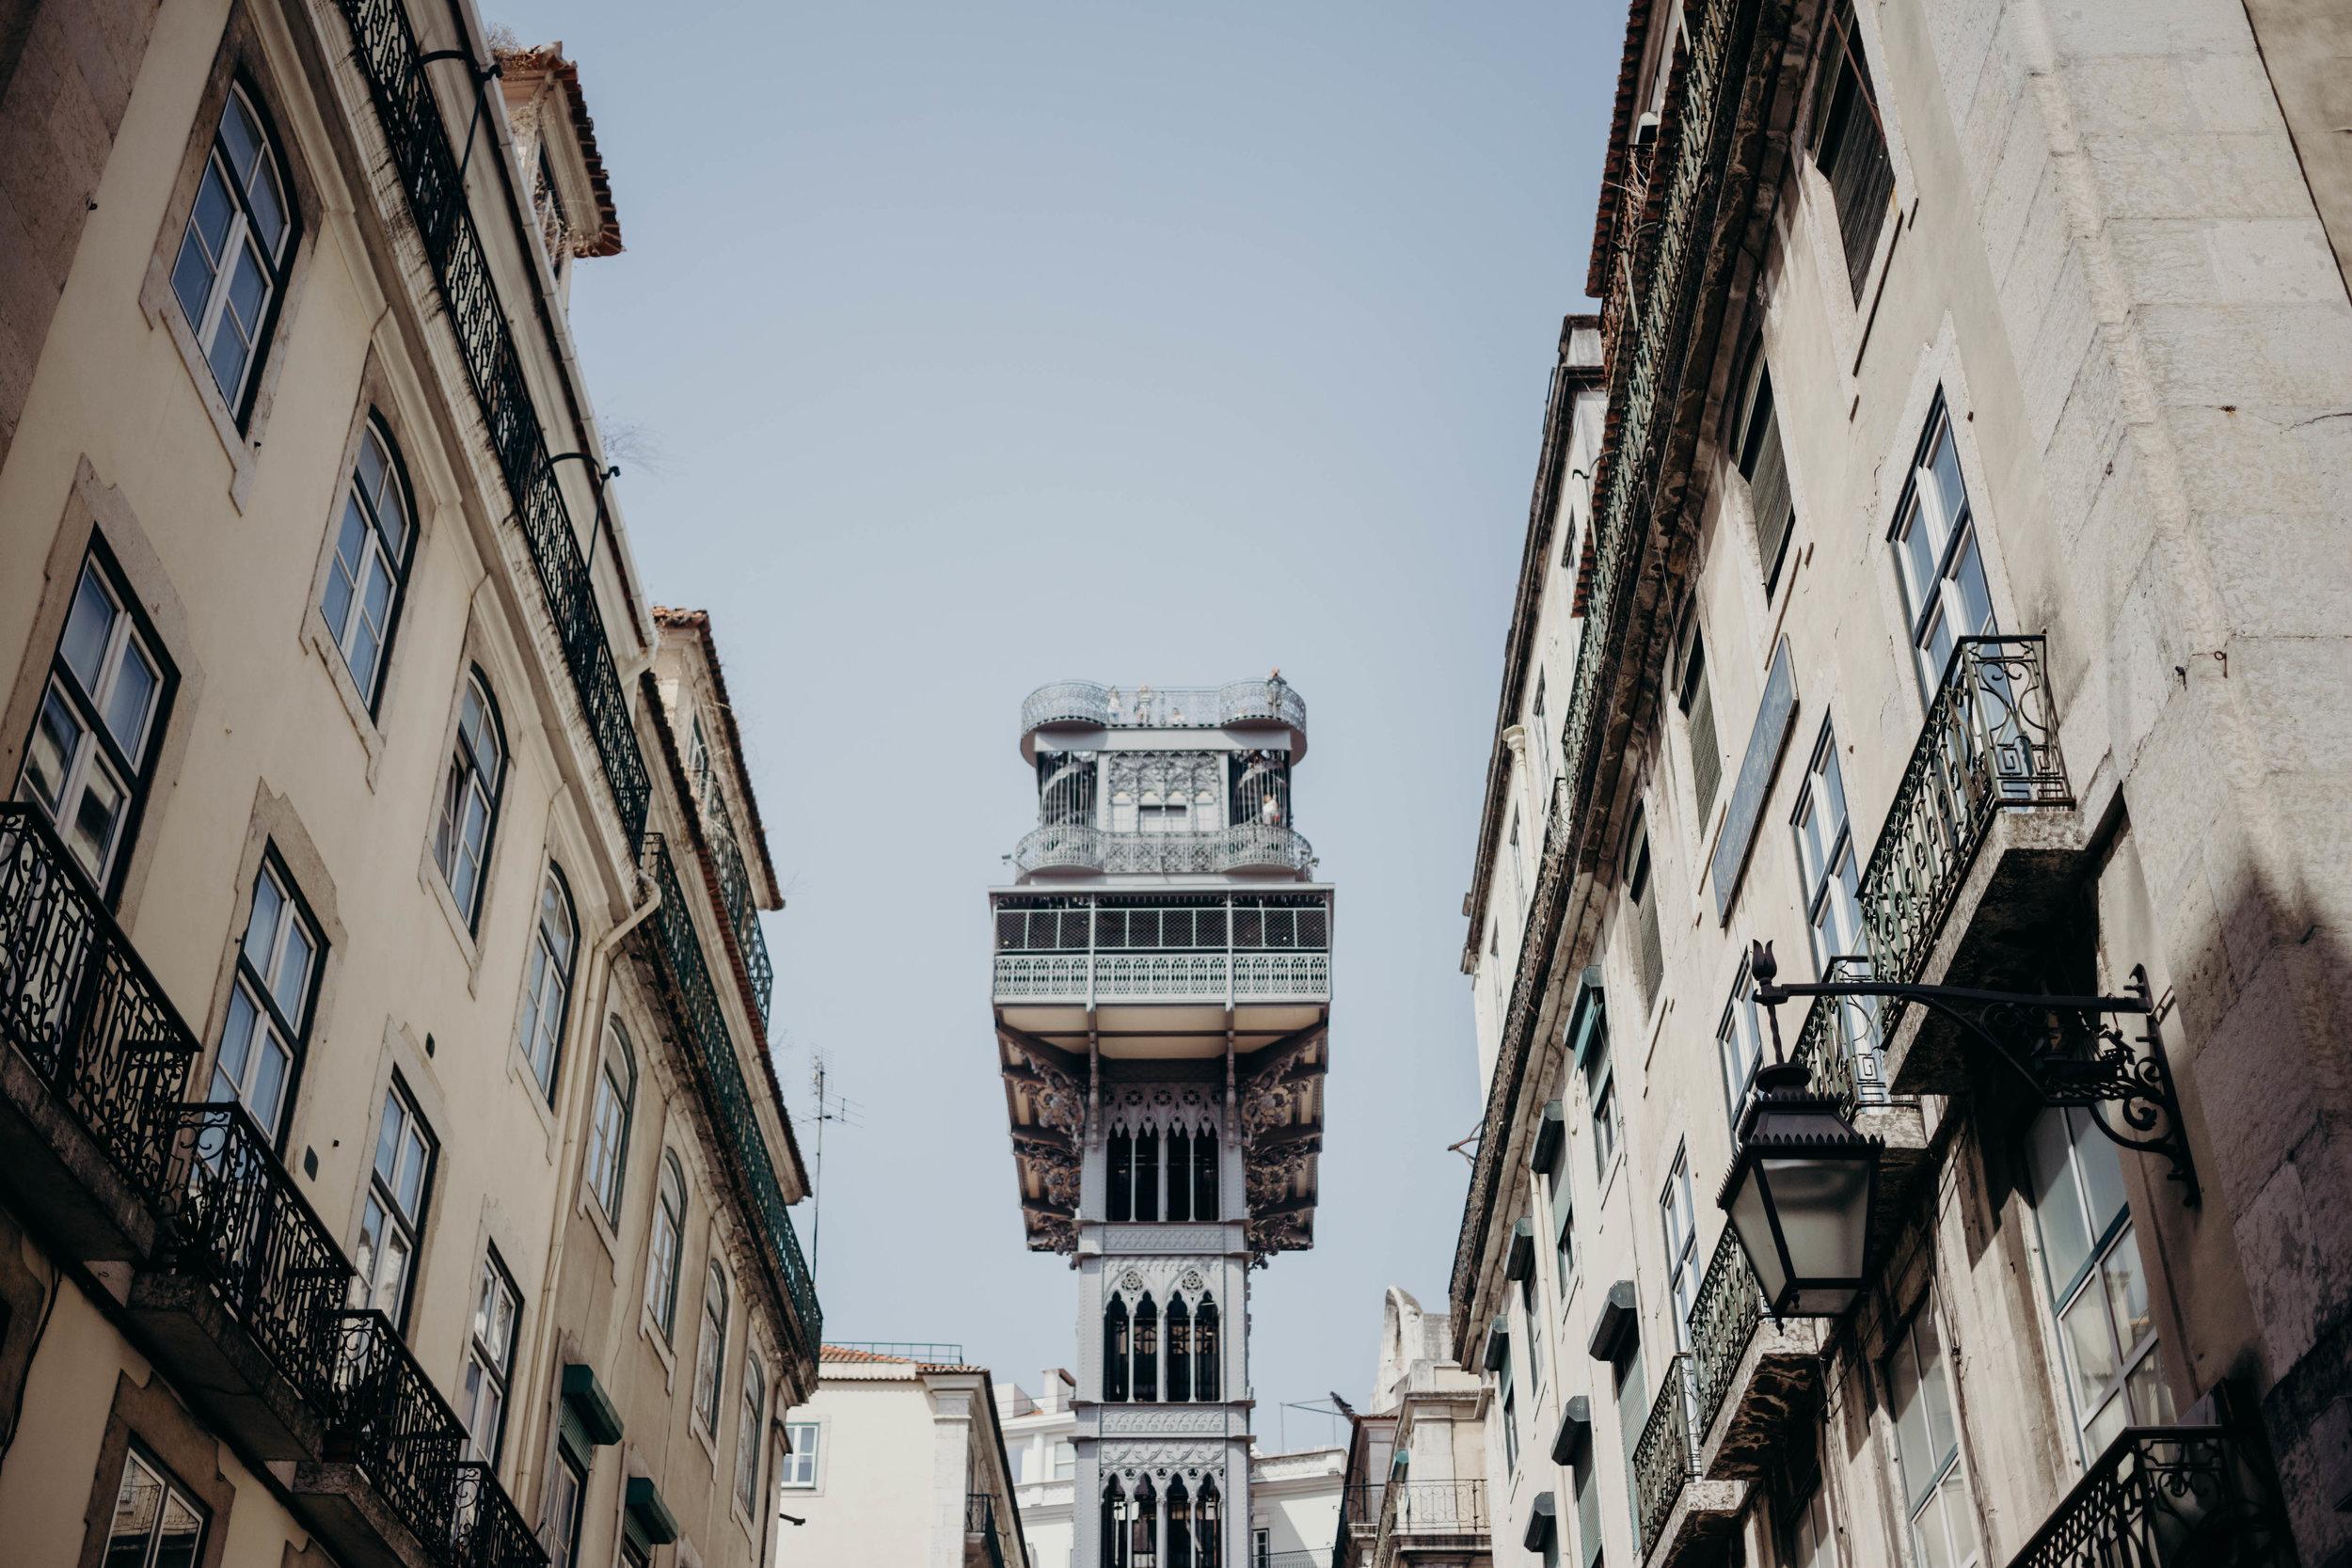 Our Portugal Travel Diary: Lisbon, Porto, and More | On the Street Where We Live (aretherelilactrees.com)  Santa Justa Lift, Praca do Comercio, Rua Augusta Arch